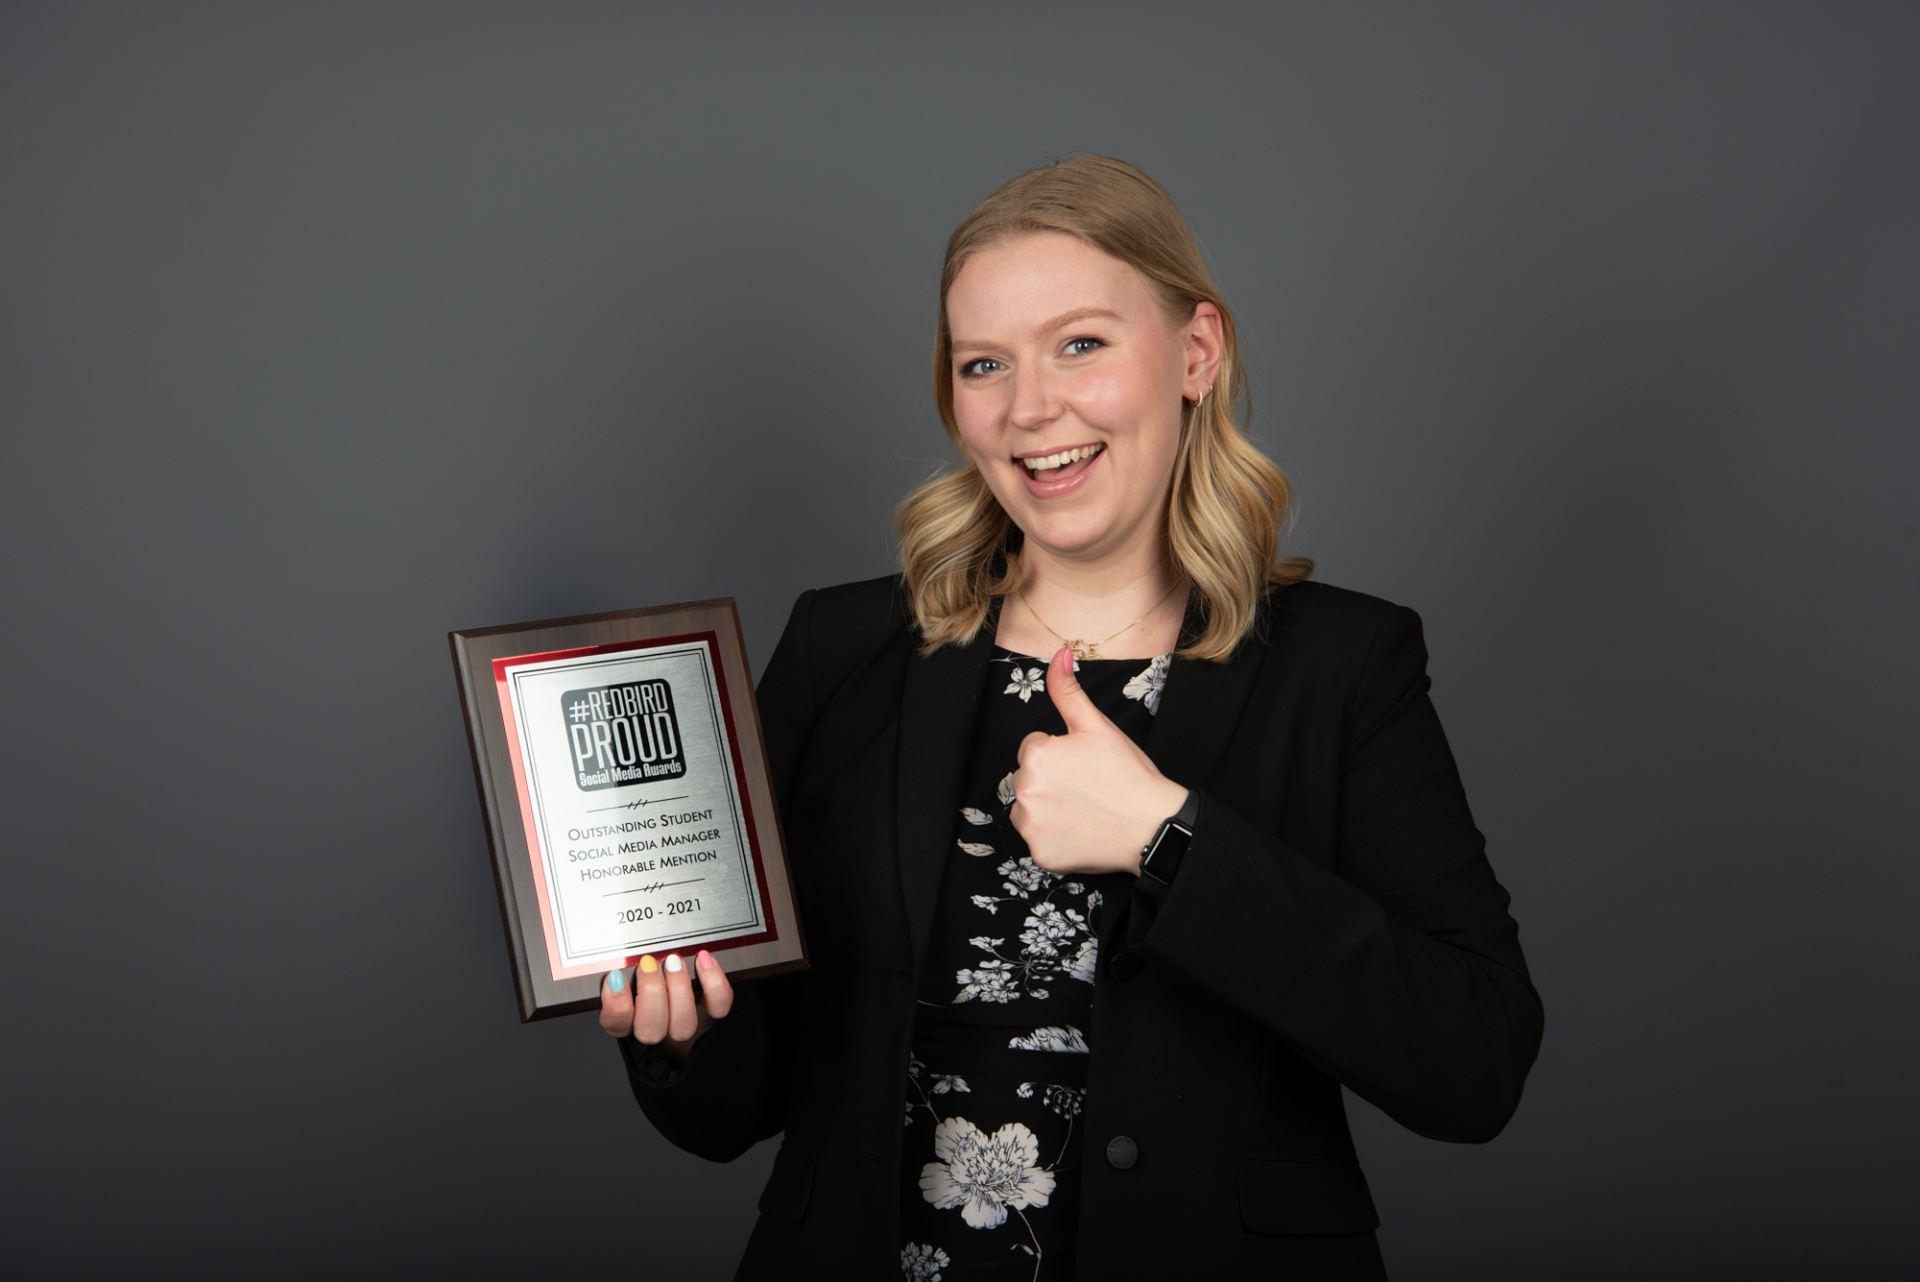 Sara Engstrom posed with award